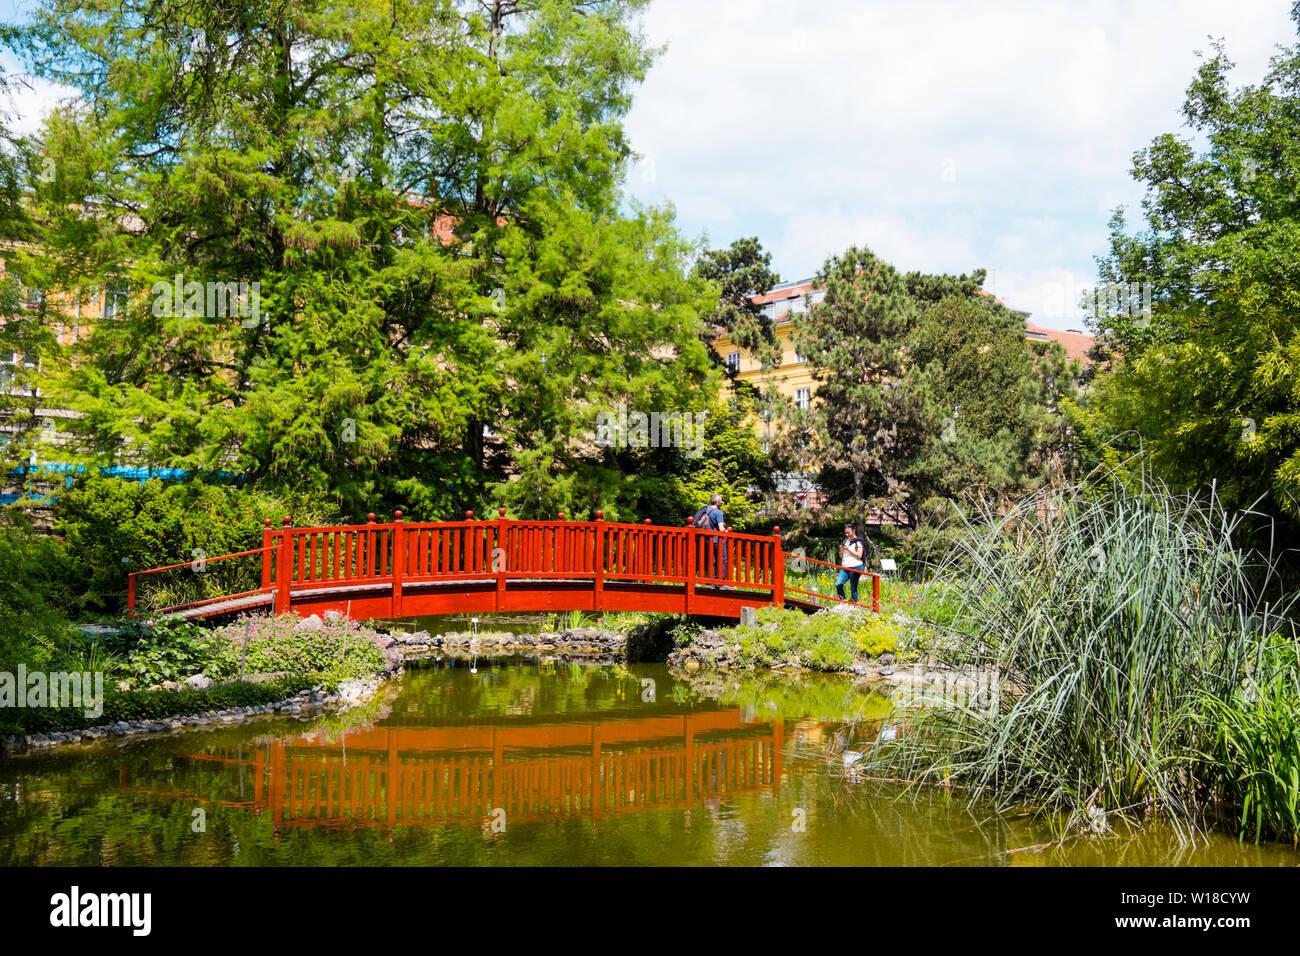 Botanicki Vrt Botanical Garden Zagreb Croatia Stock Photo Alamy